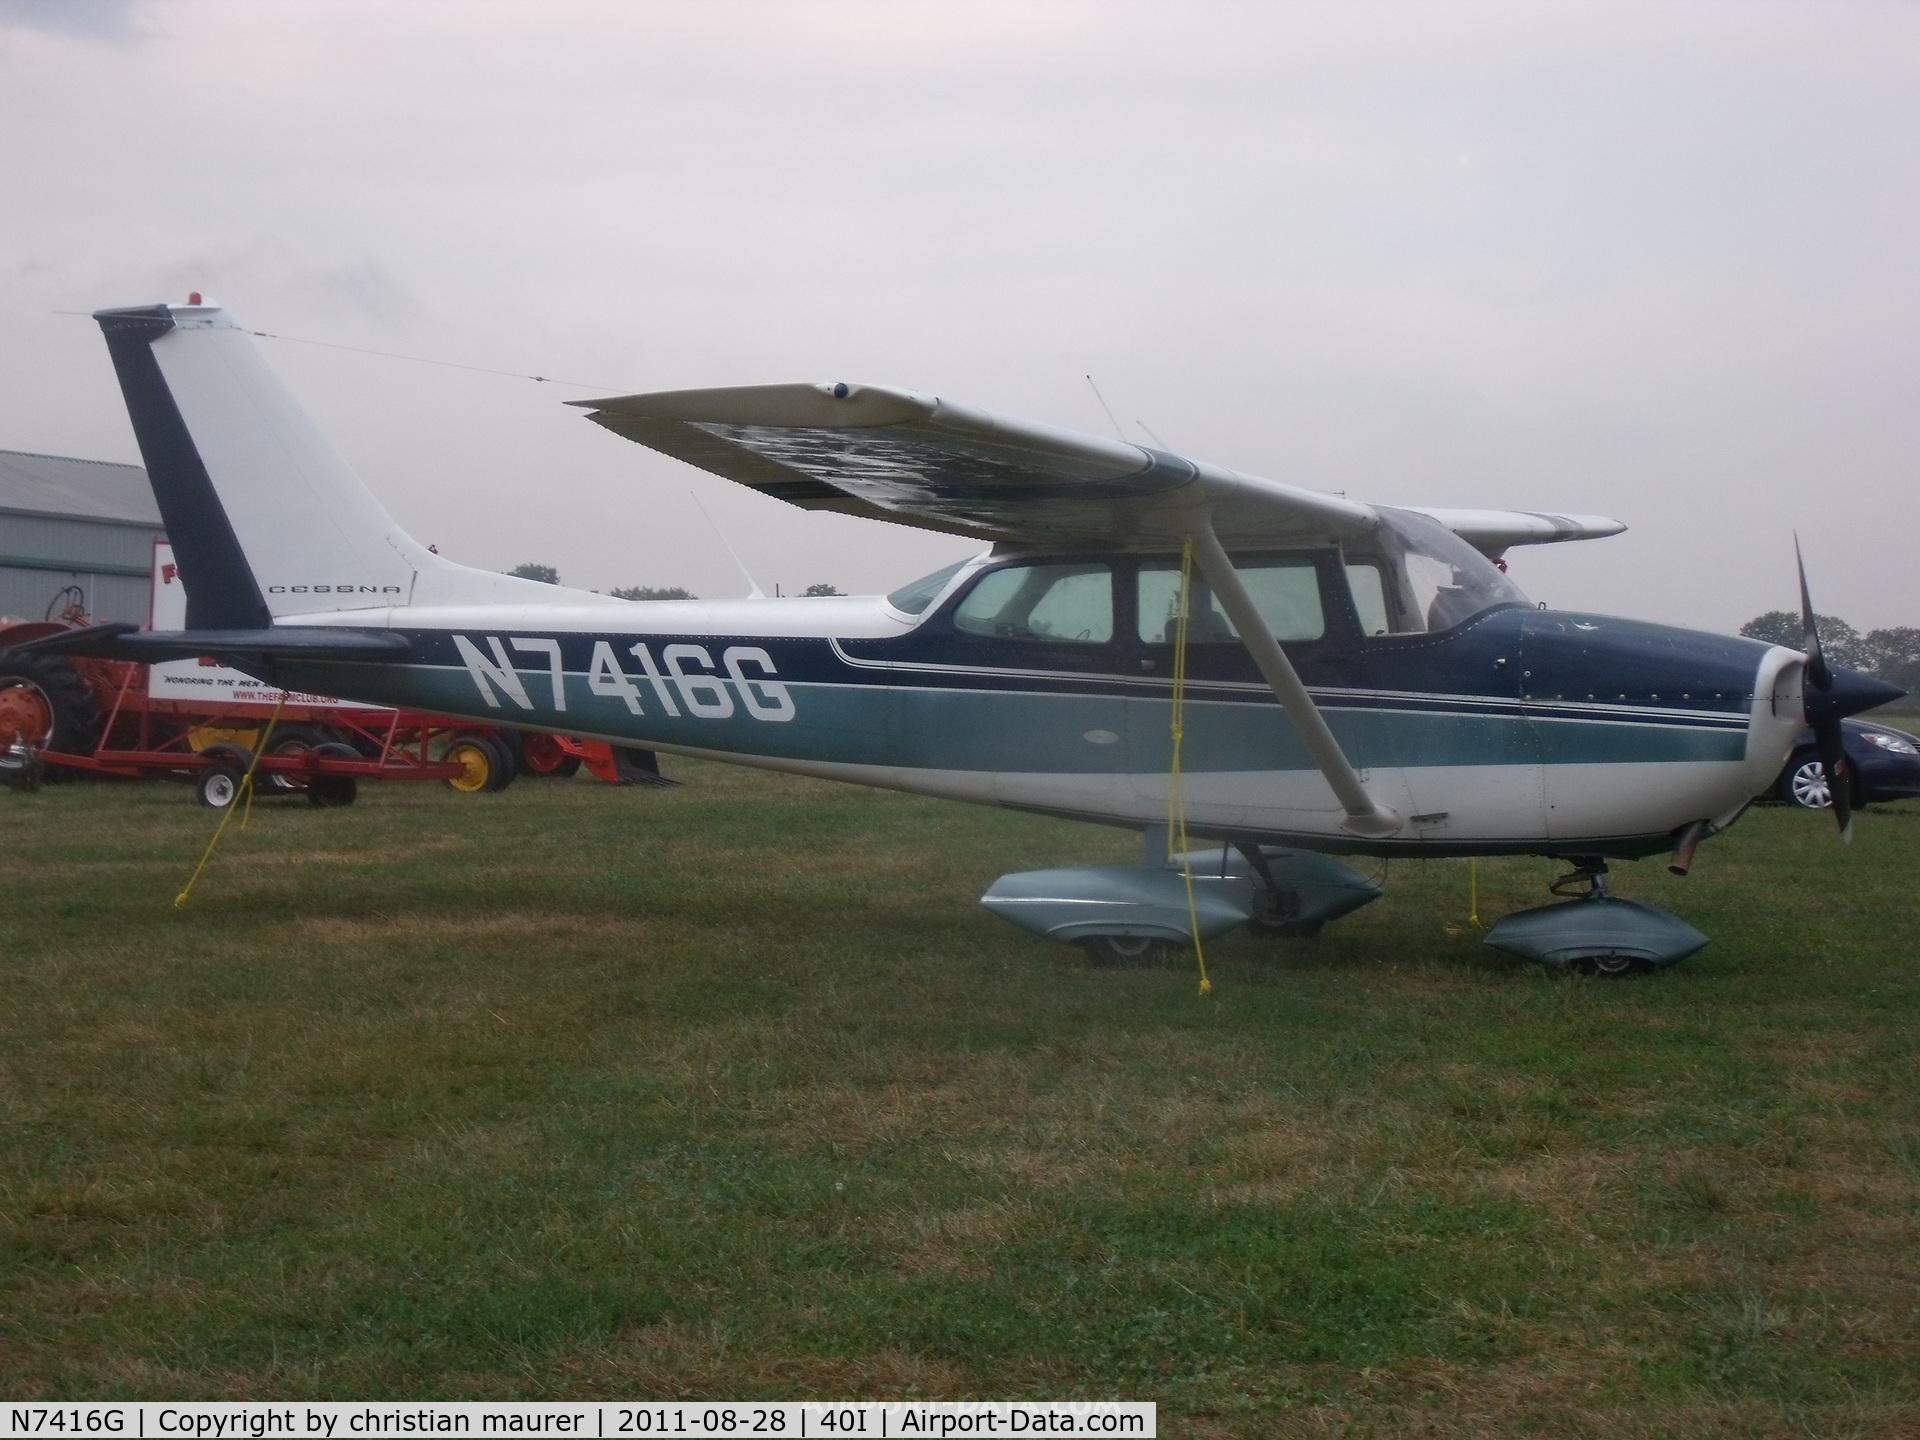 N7416G, 1970 Cessna 172K Skyhawk C/N 17259116, 172